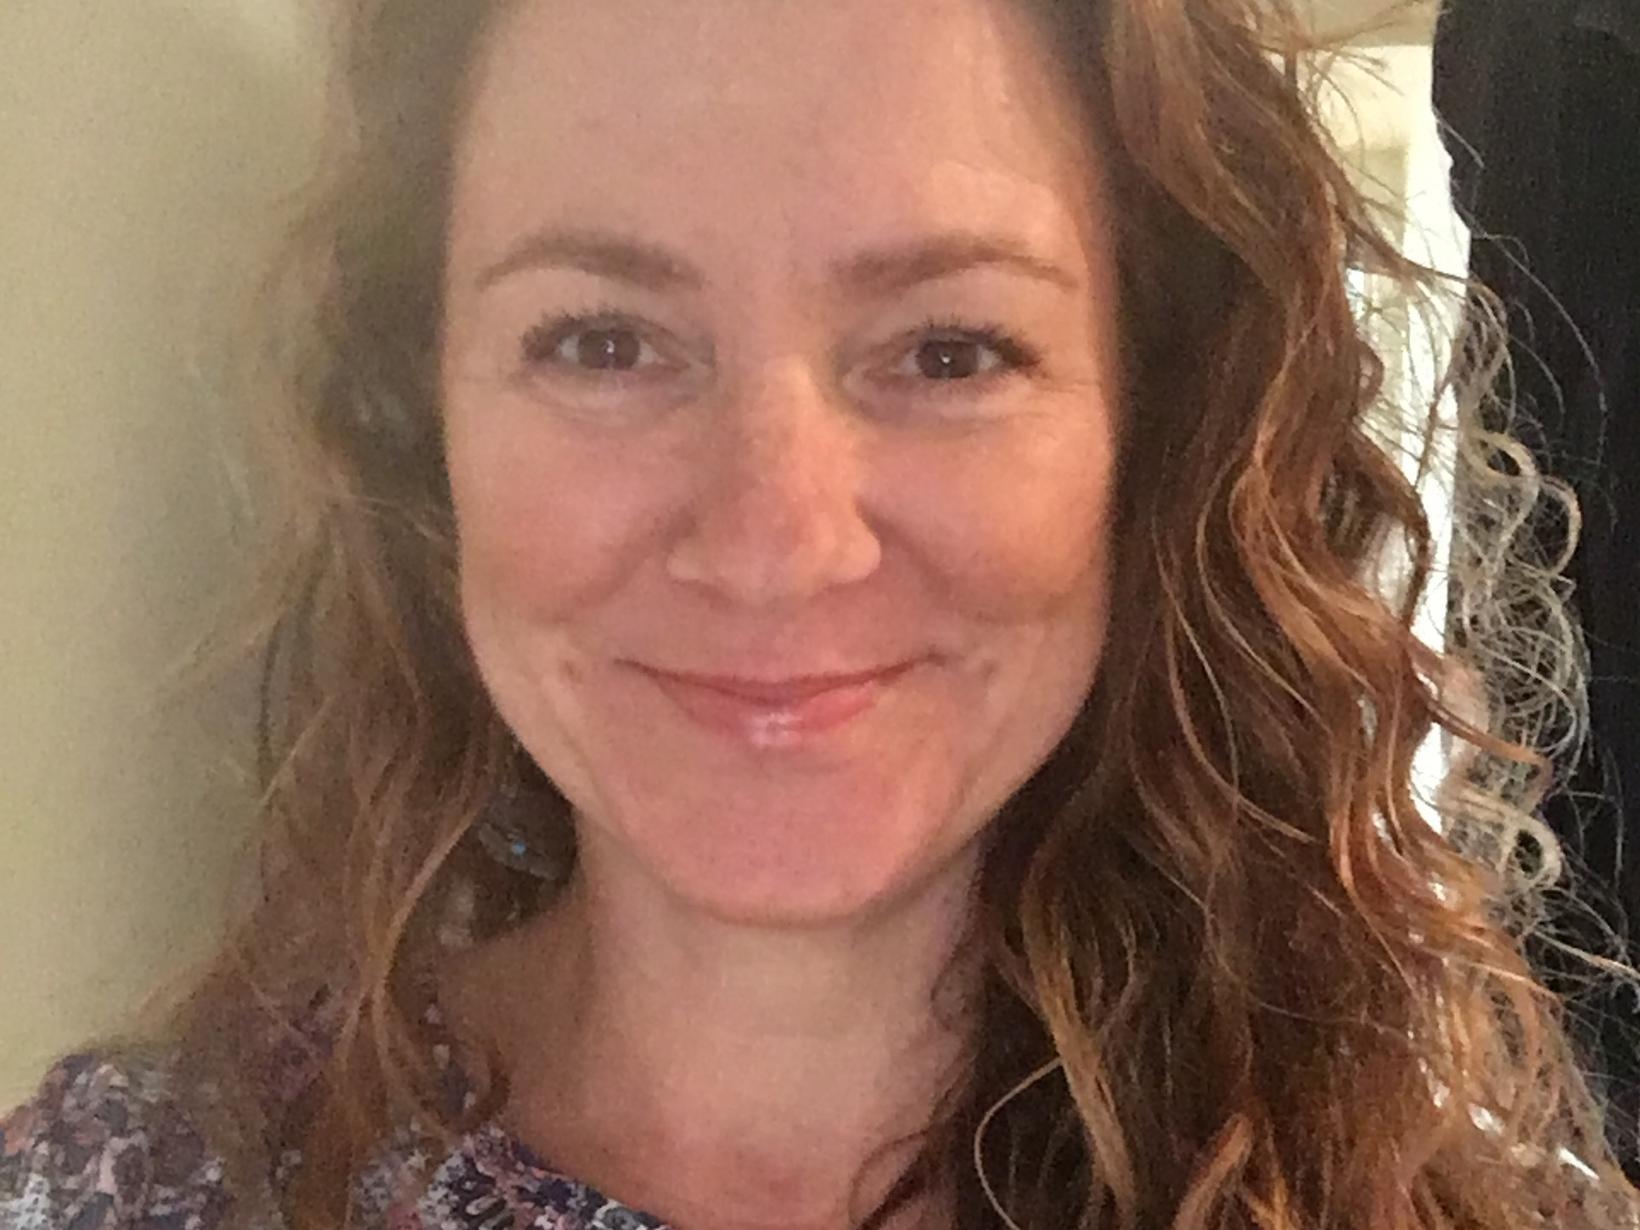 Rachel from Bristol, United Kingdom